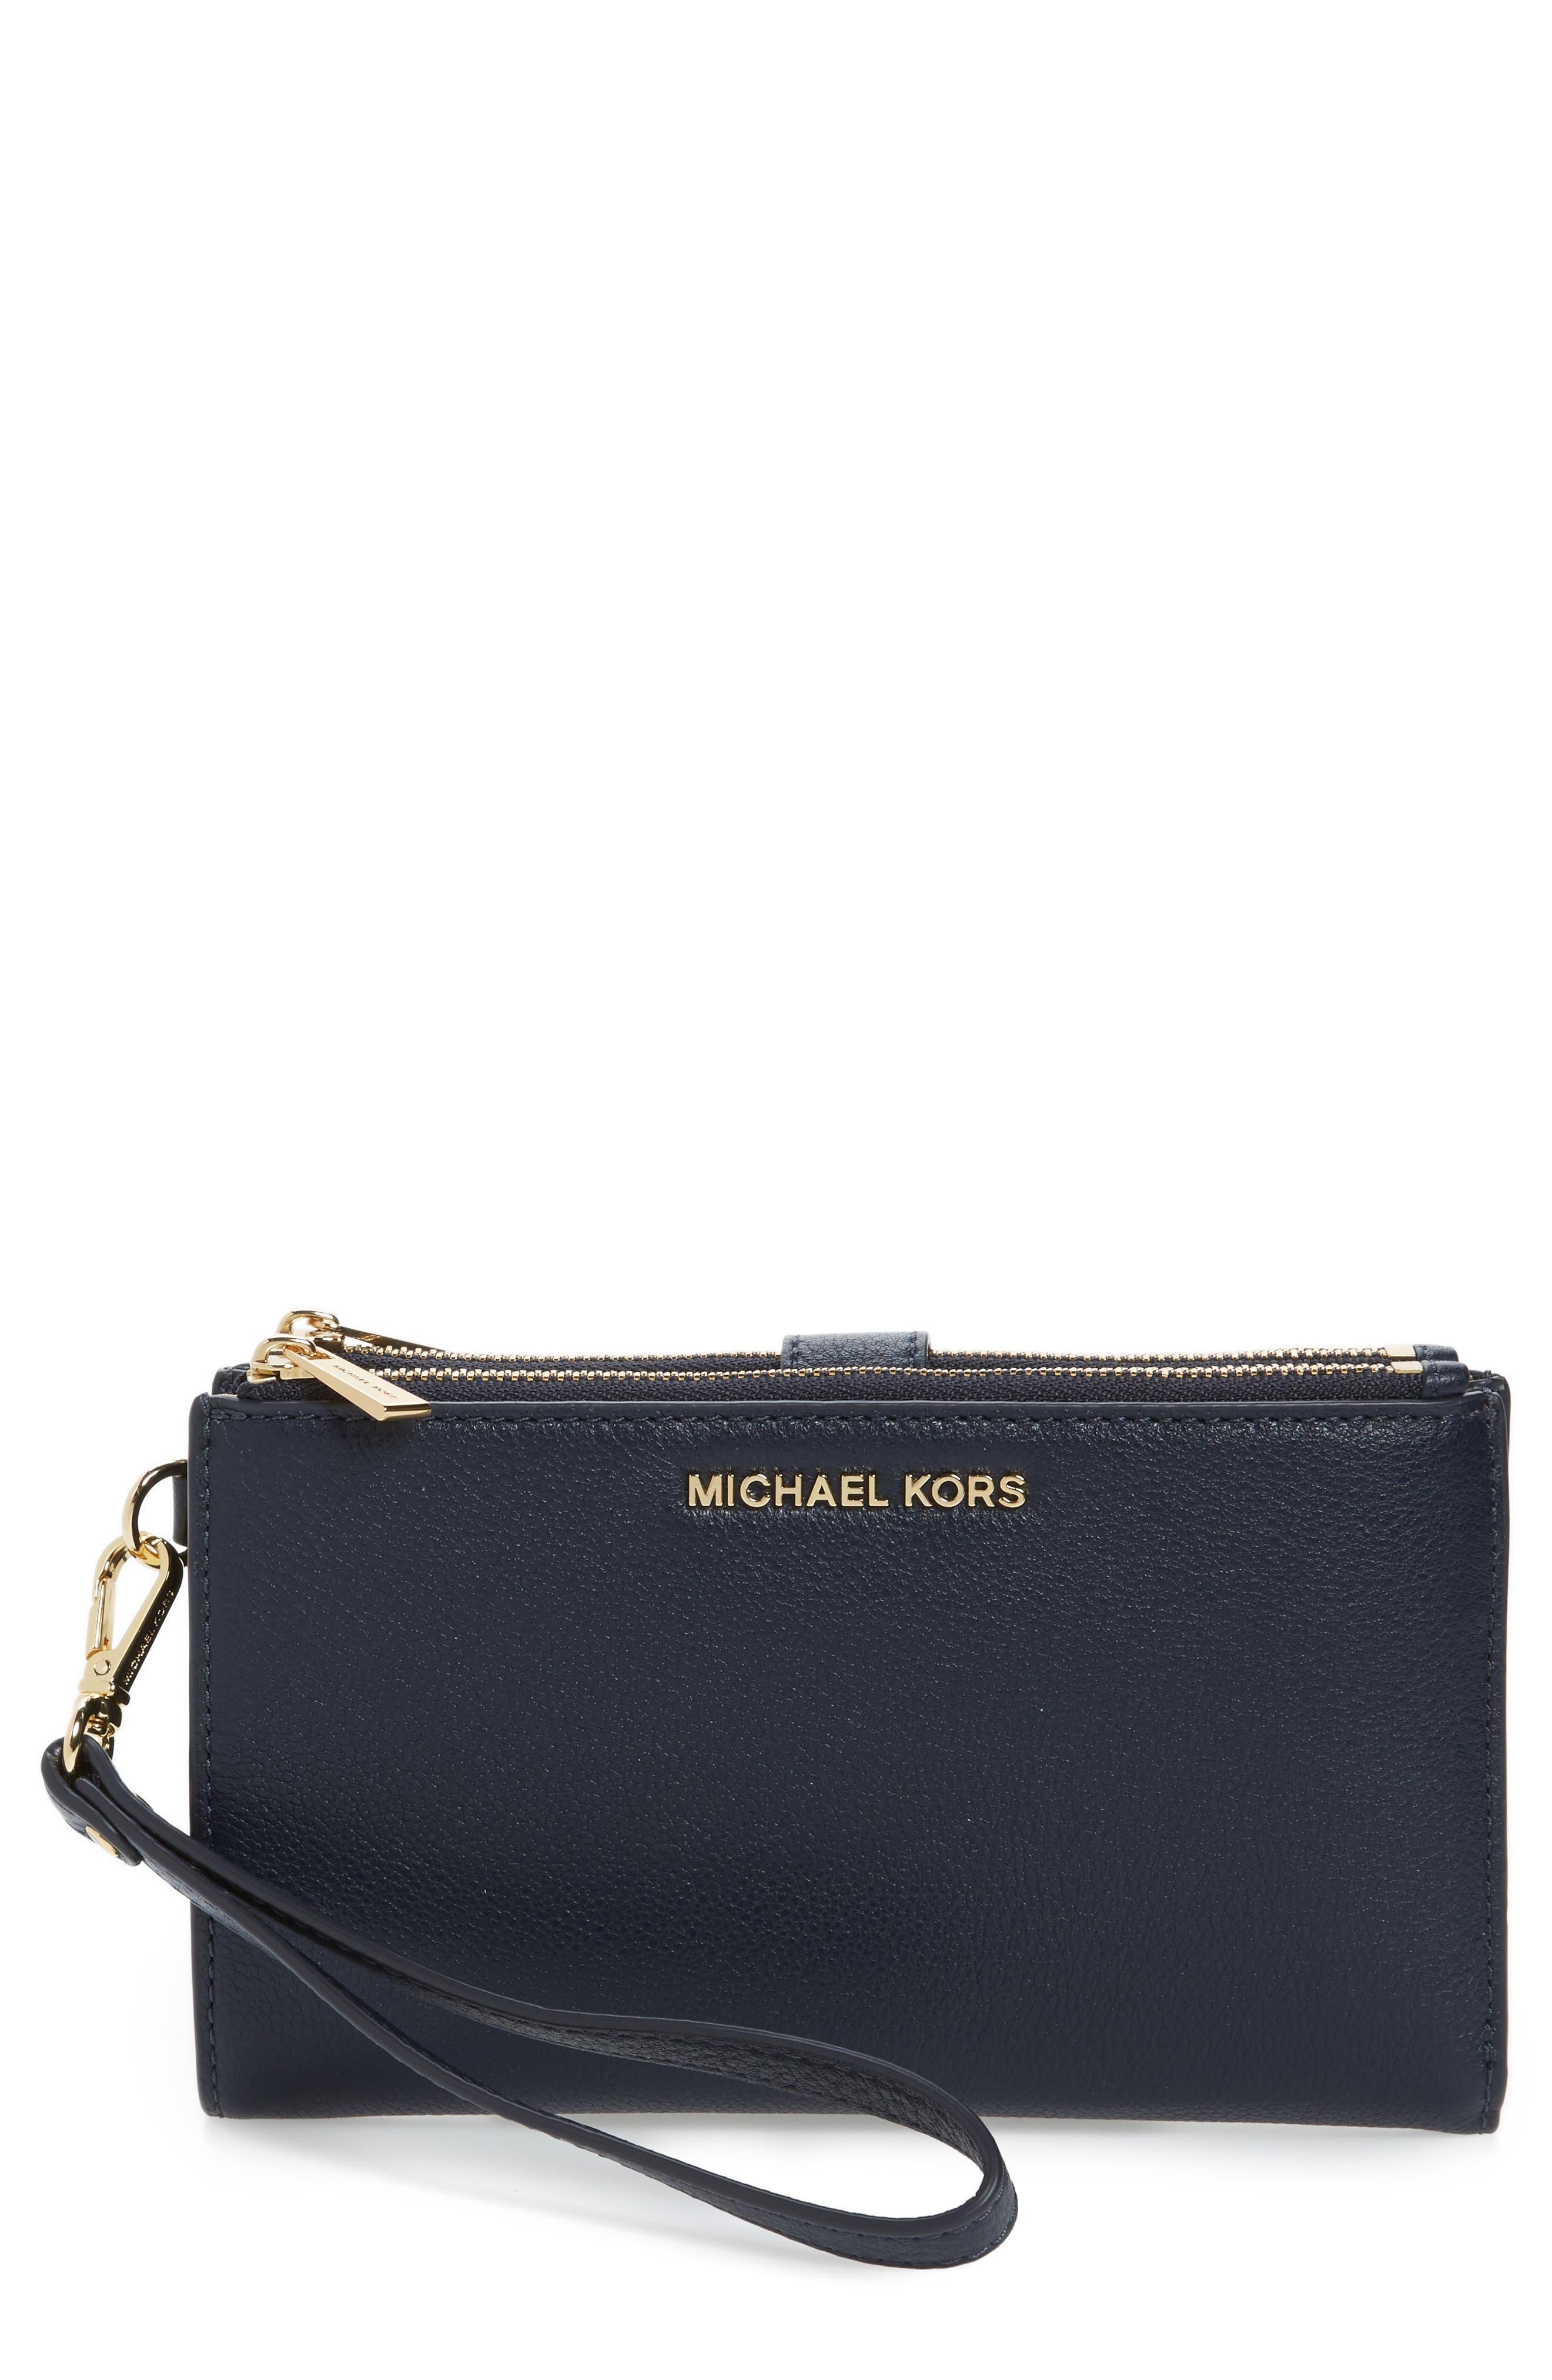 Alternate Image 1 Selected - MICHAEL Michael Kors Adele Leather Wristlet